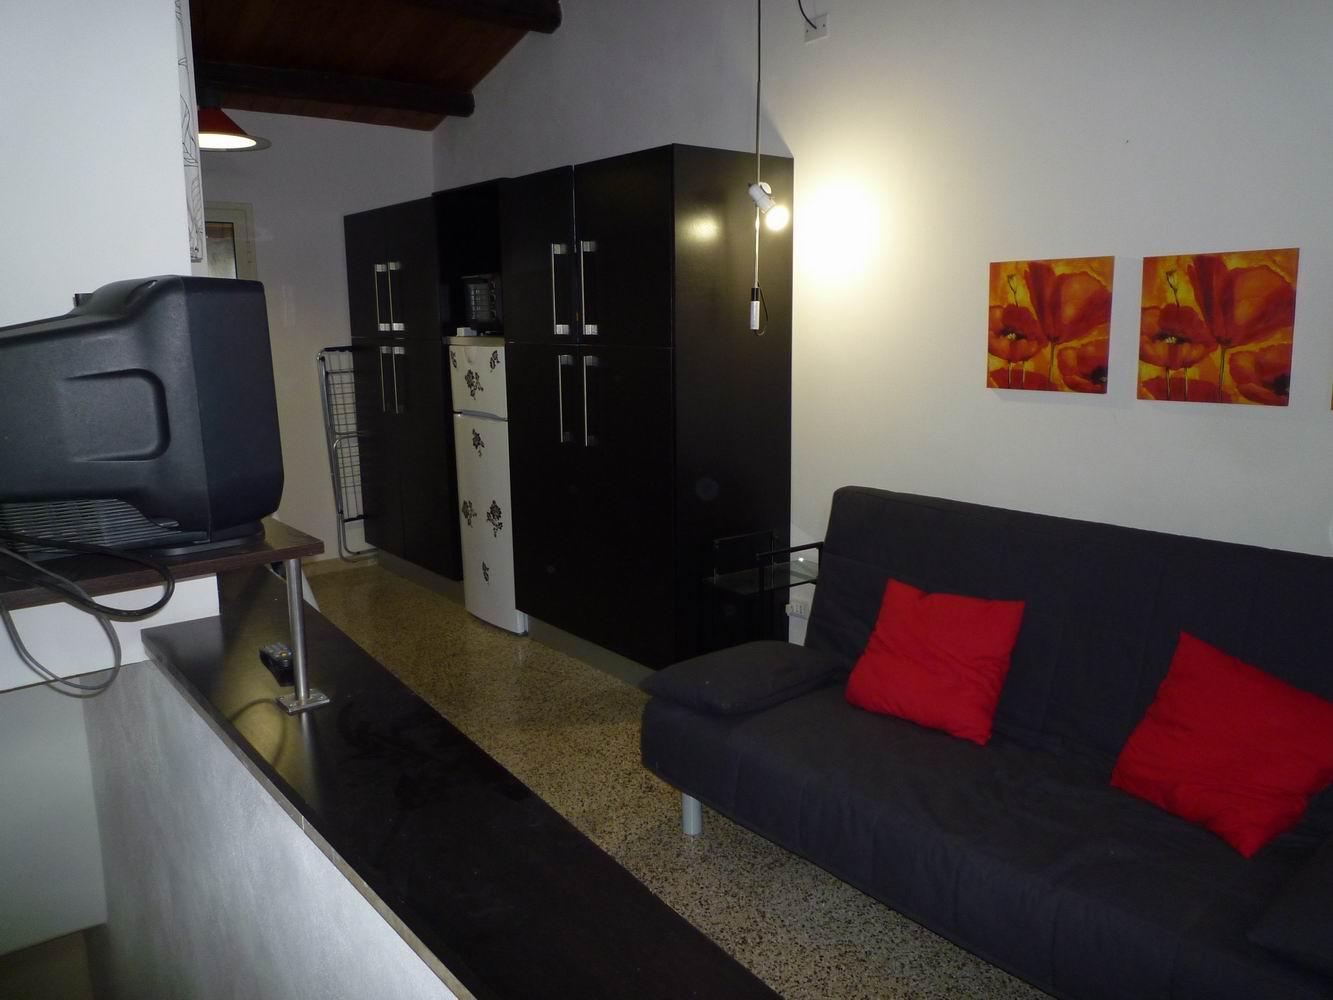 Appartamento Monolocale a Alcamo in via francesco laurana - 01